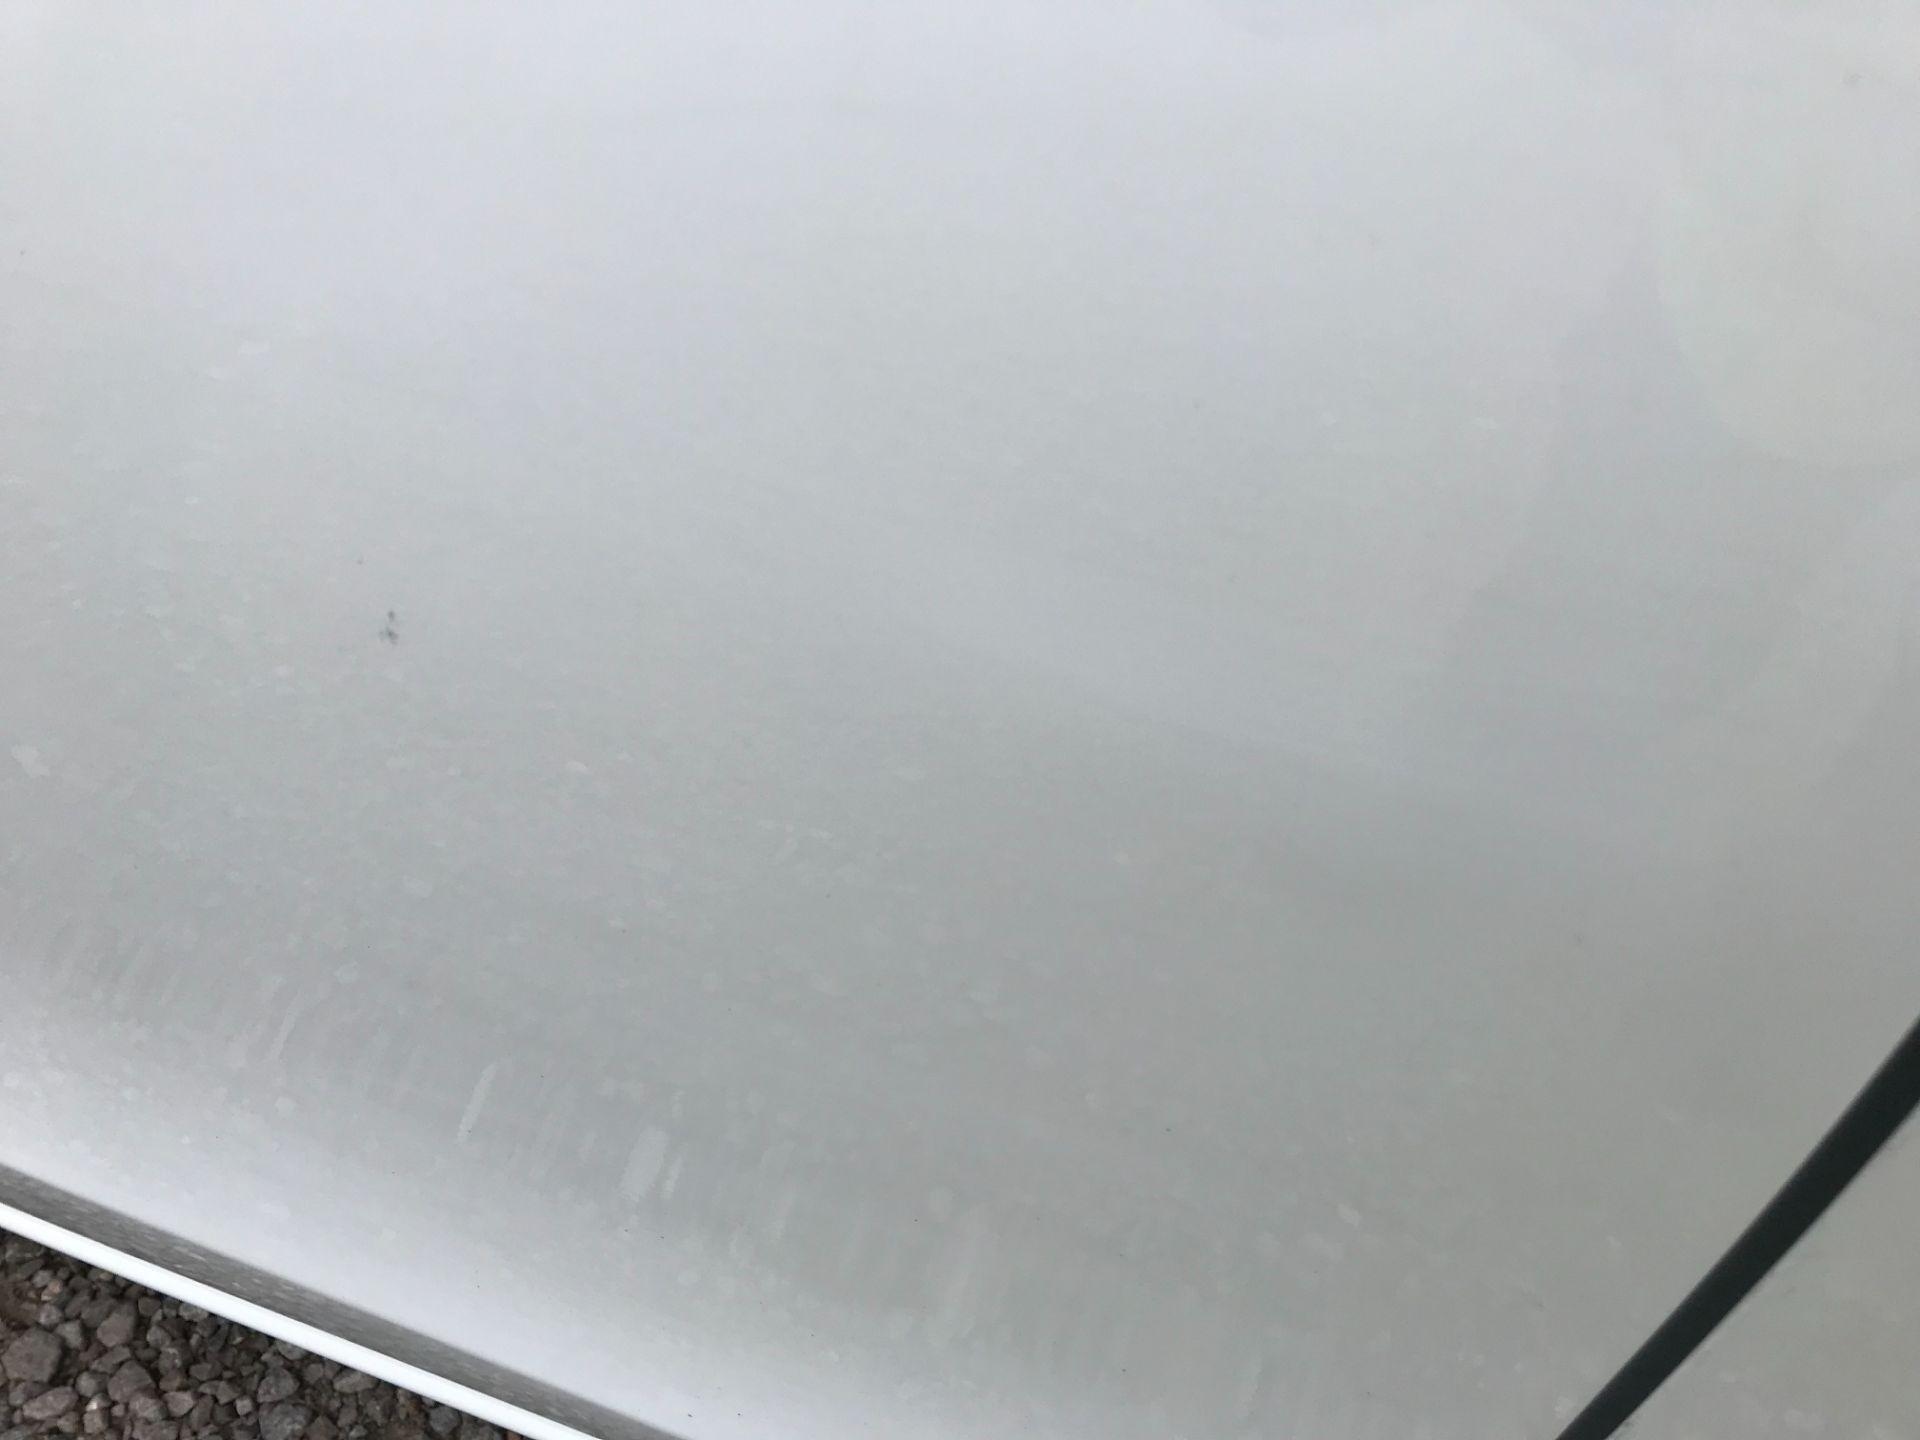 2017 Mercedes-Benz Vito LONG 111CDI VAN EURO 6  (KM67BCV) Image 41